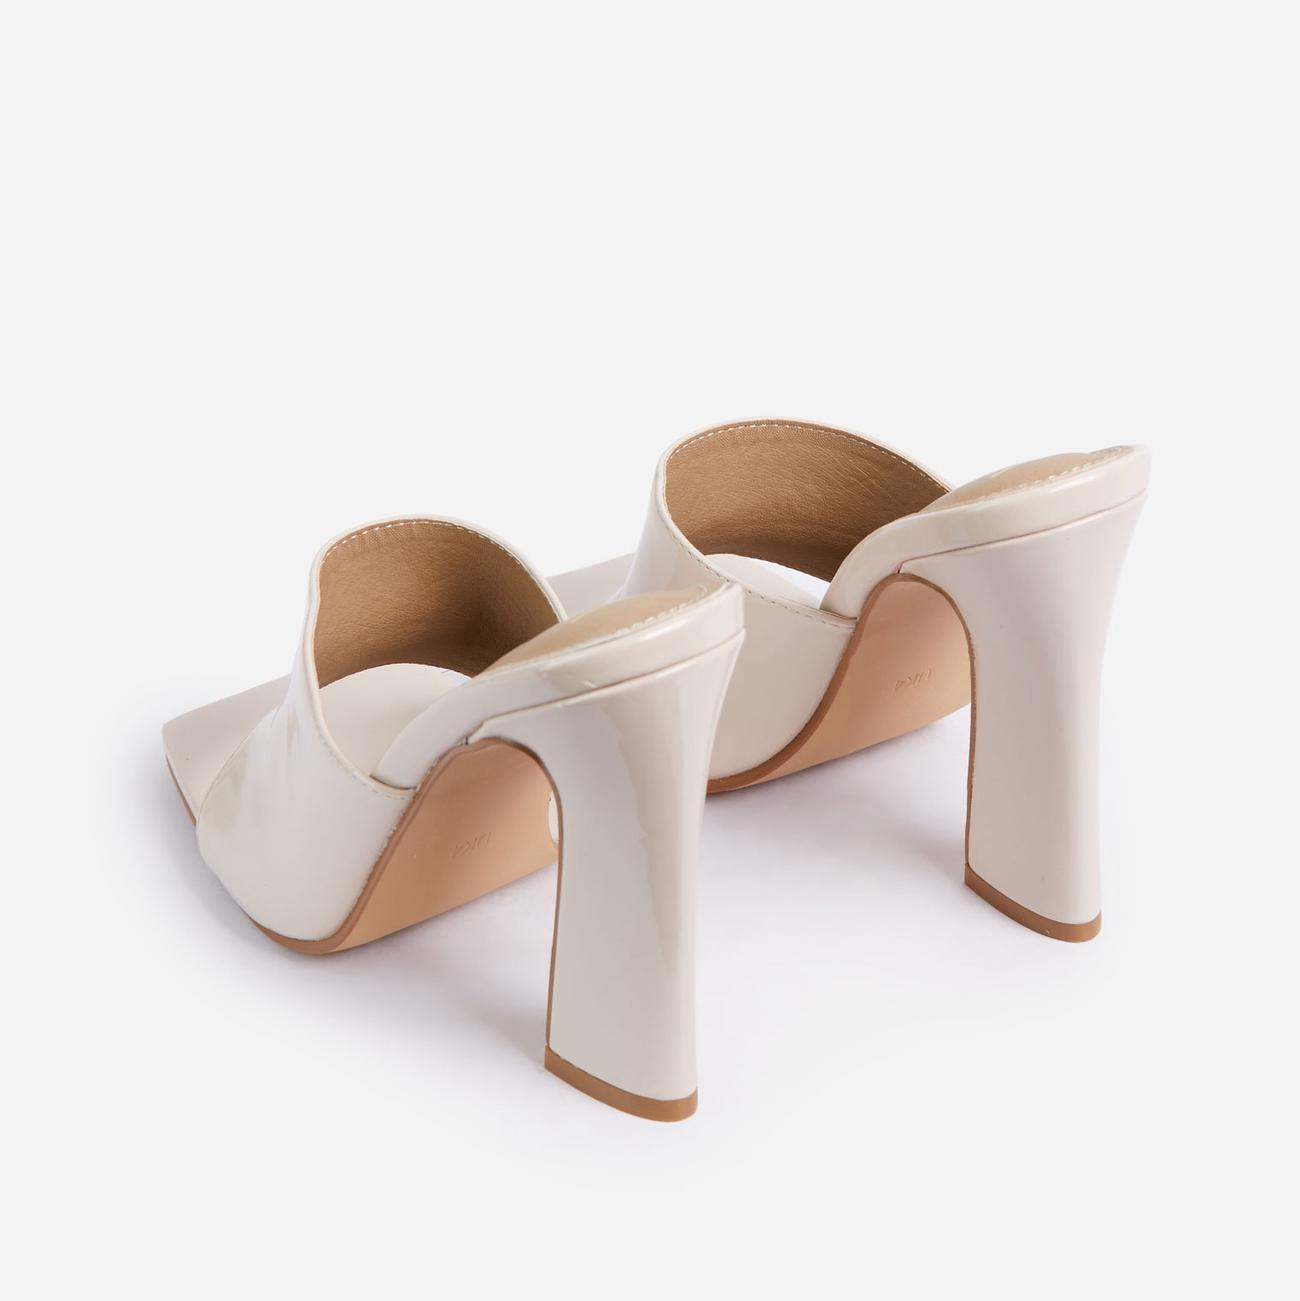 Begins Square Peep Toe Flared Block Heel Mule In Cream Patent Image 3